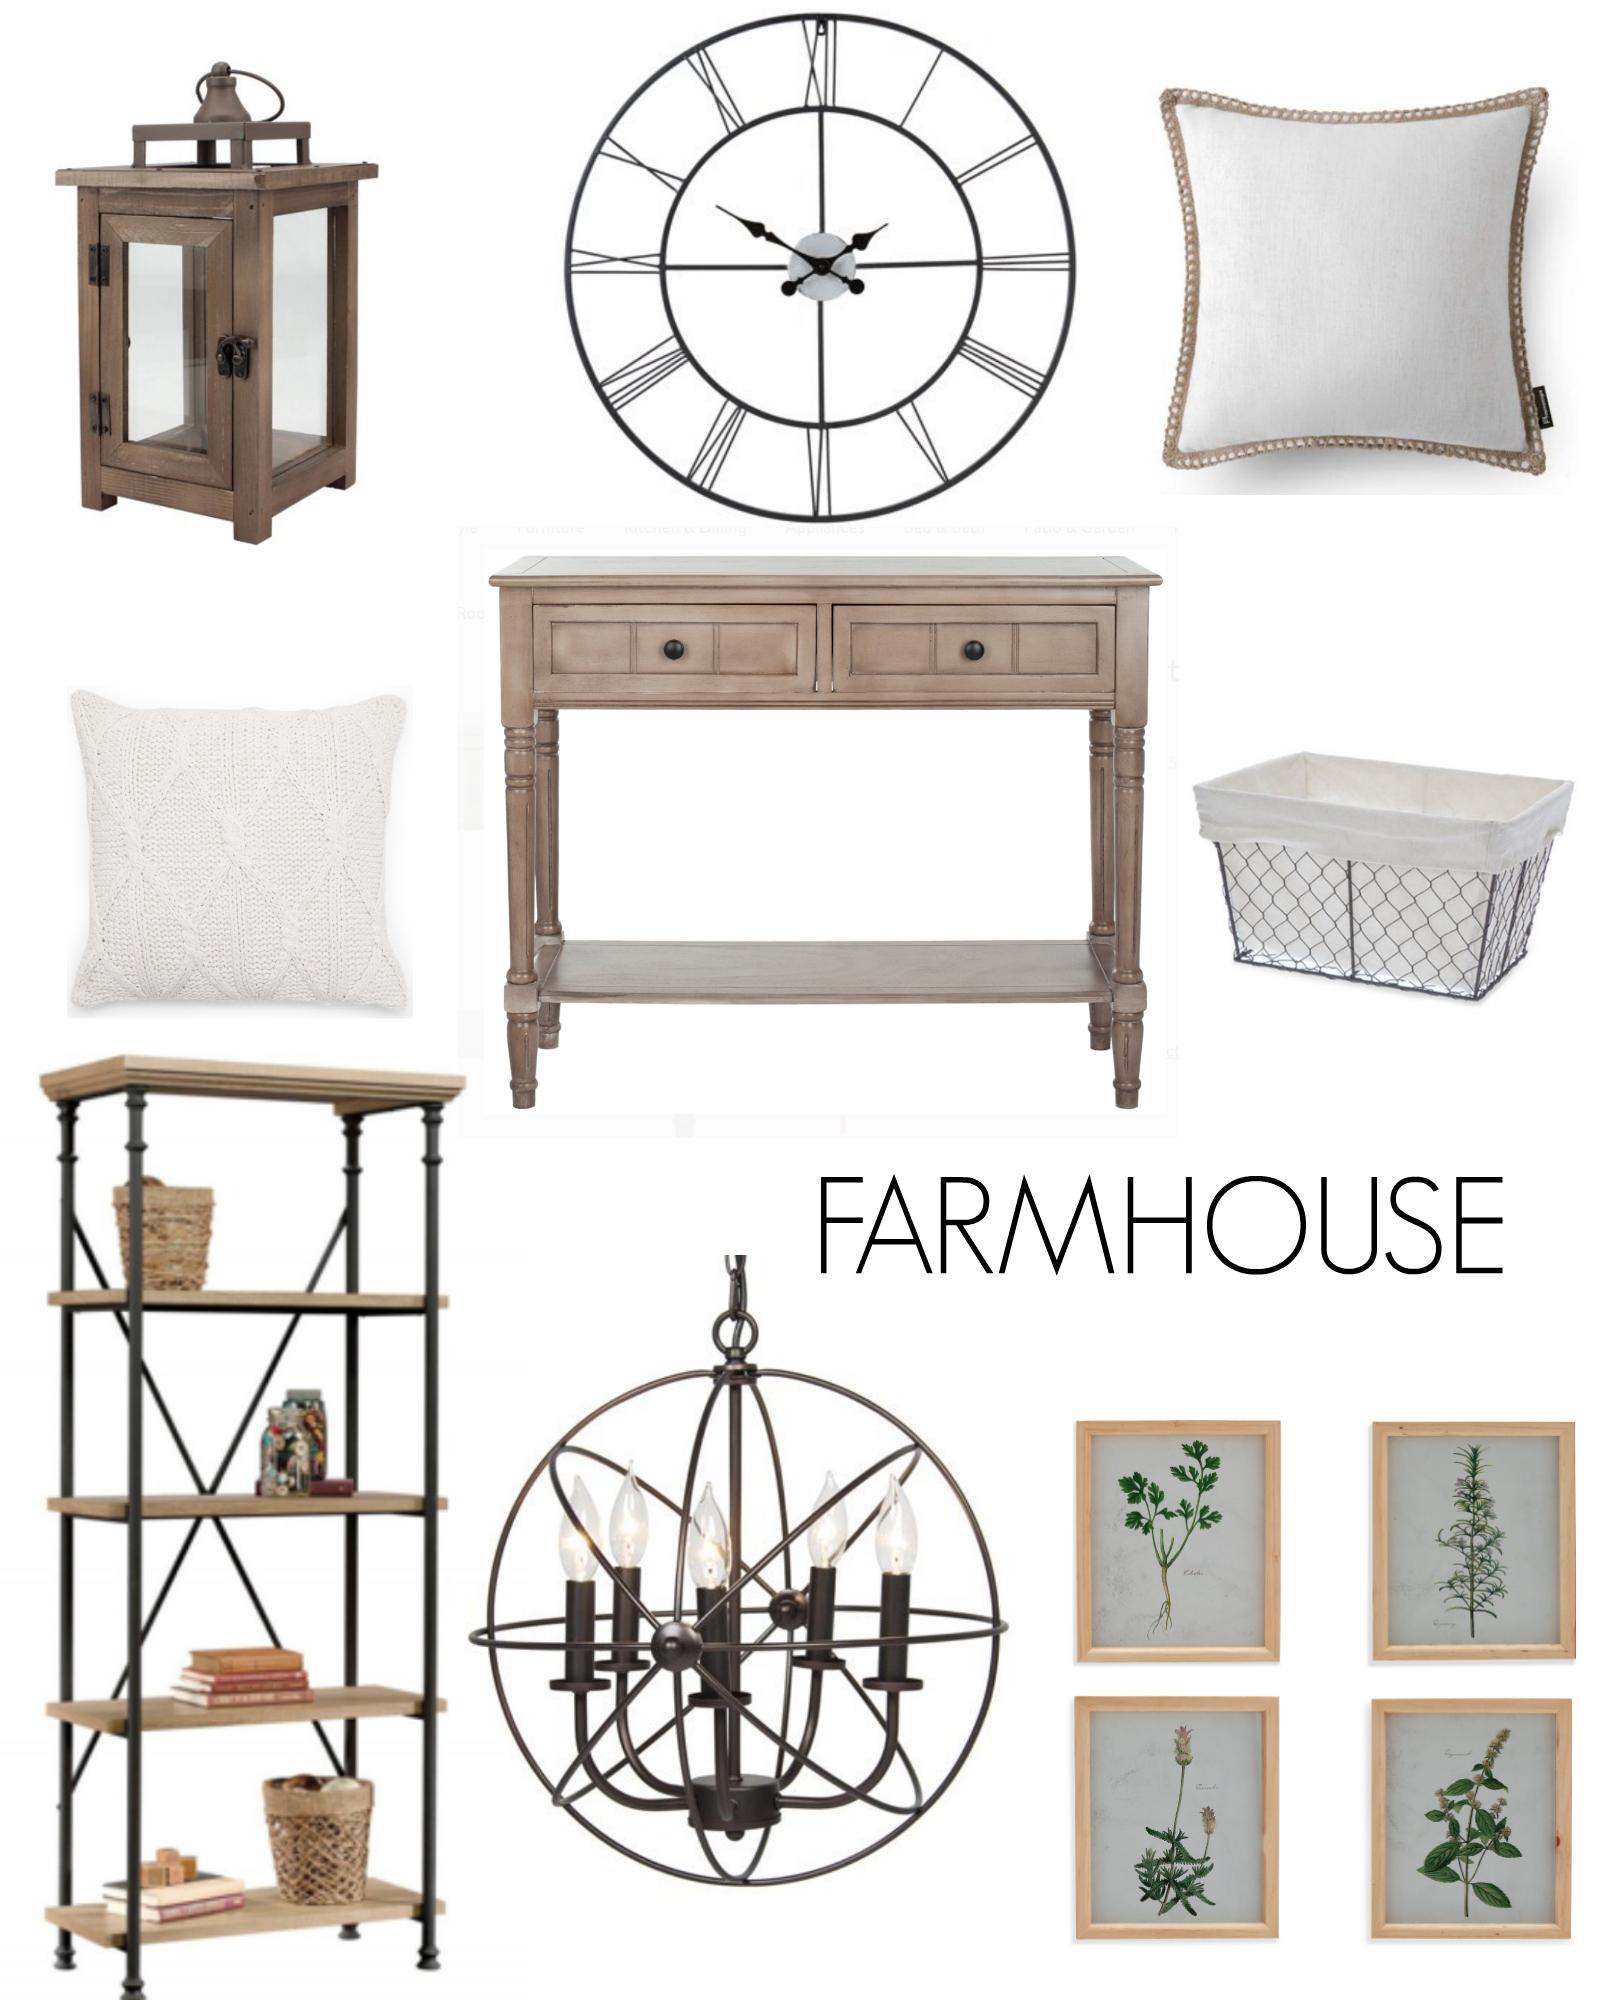 FARMHOUSE home decor inspo affordable walmart home decor Laura Beverlin house